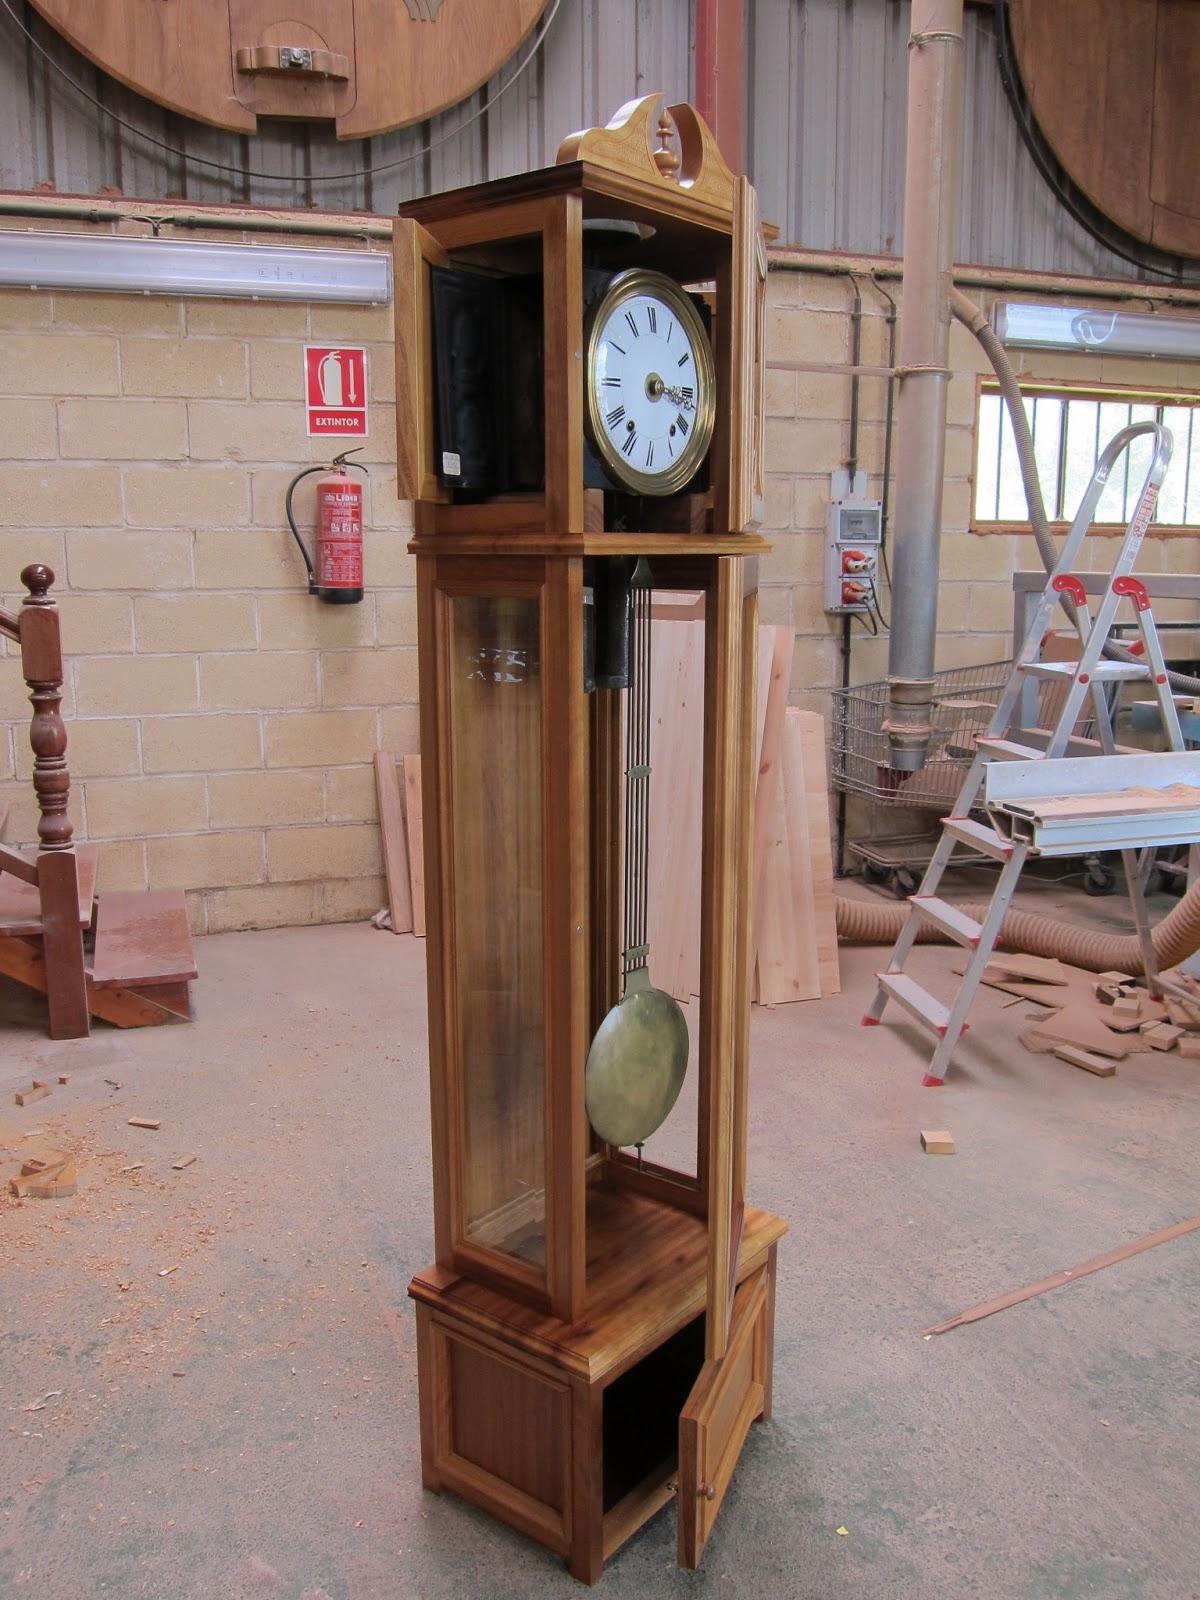 Carpinter a y toneler a caja para reloj con pendulo for Relojes de pared antiguos de pendulo